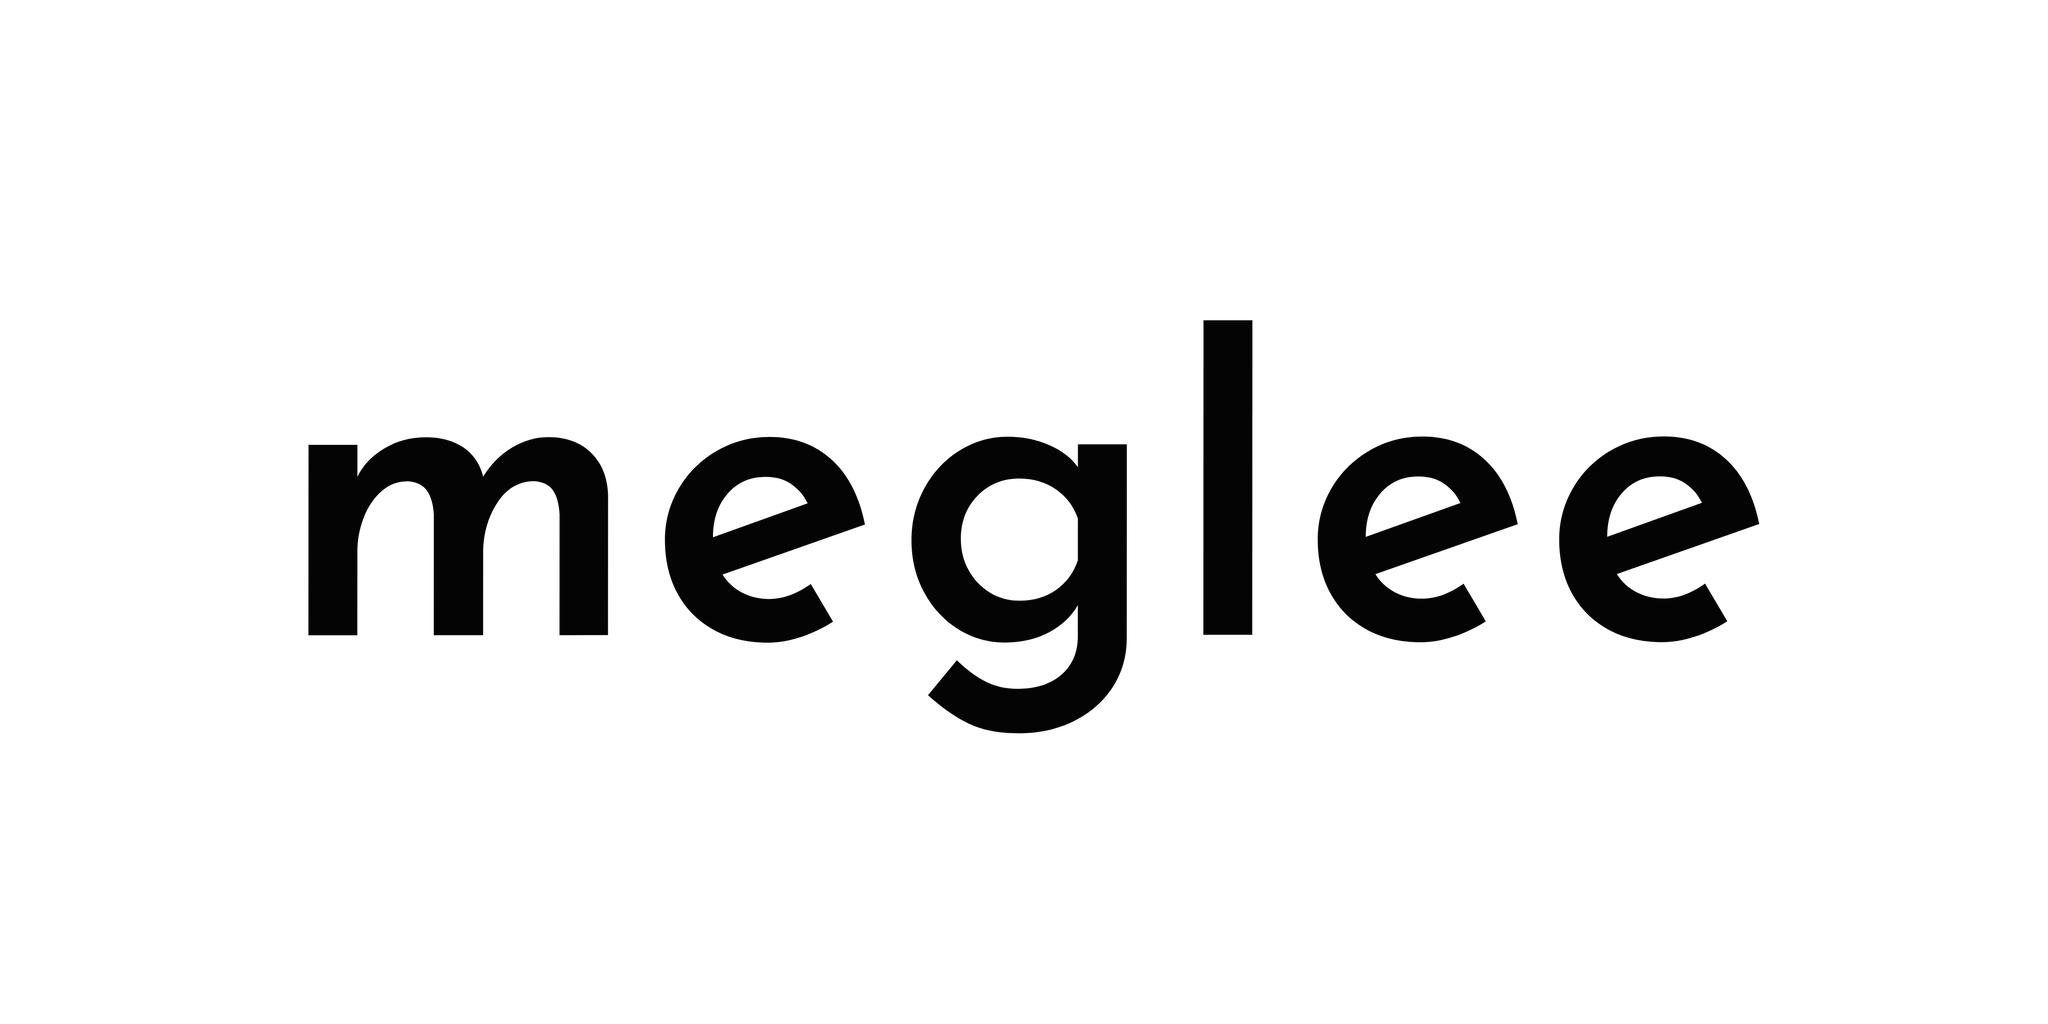 meglee